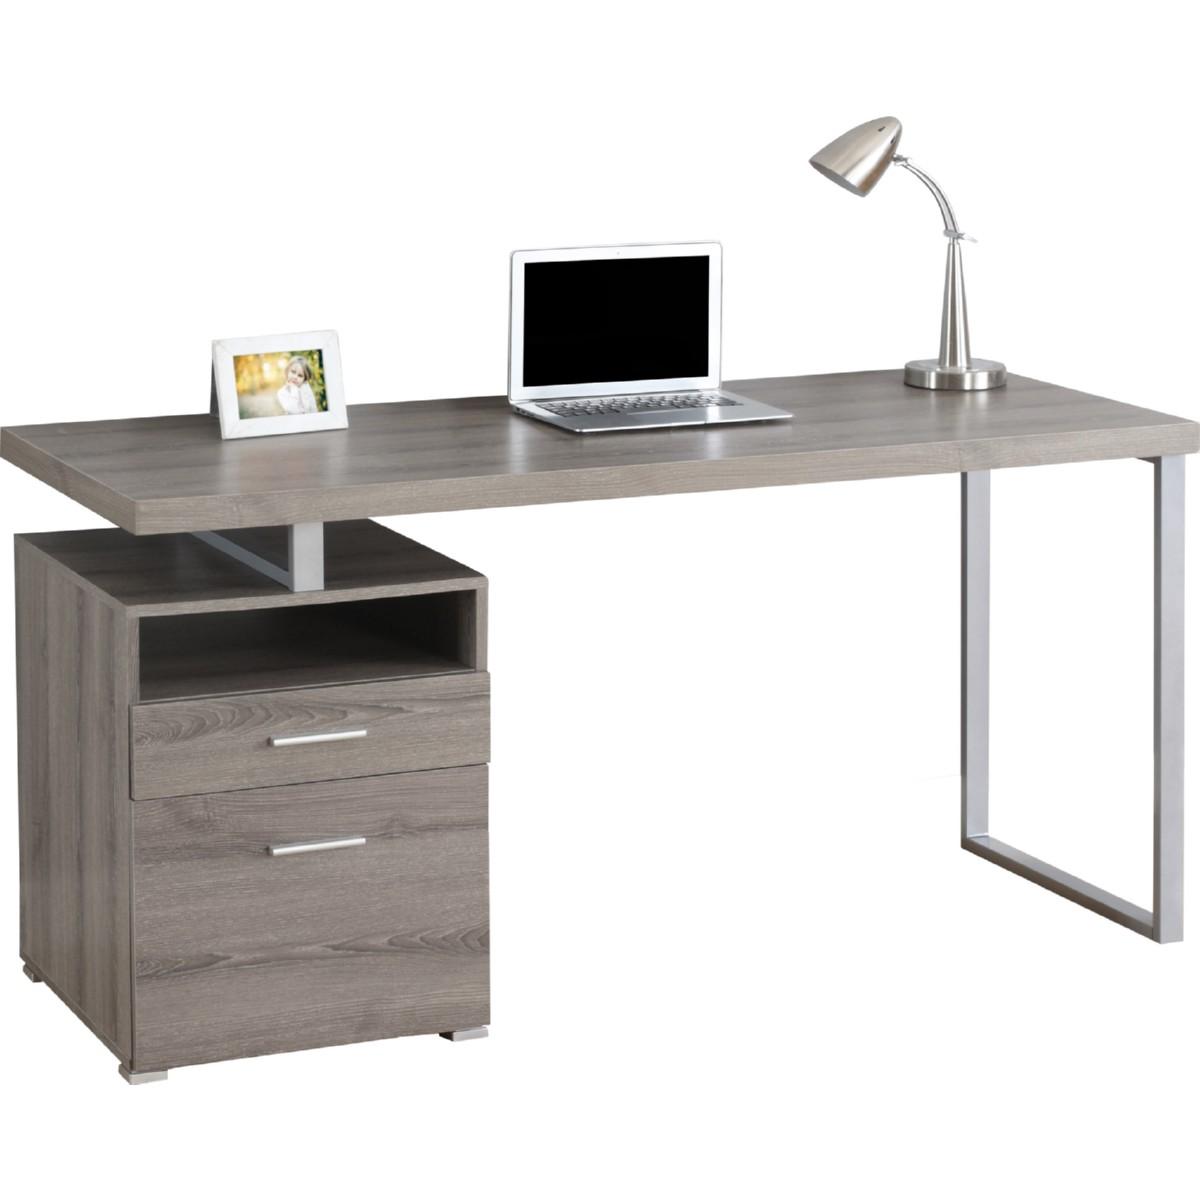 Monarch Specialties I 7145 60 Computer Desk In Reclaimed